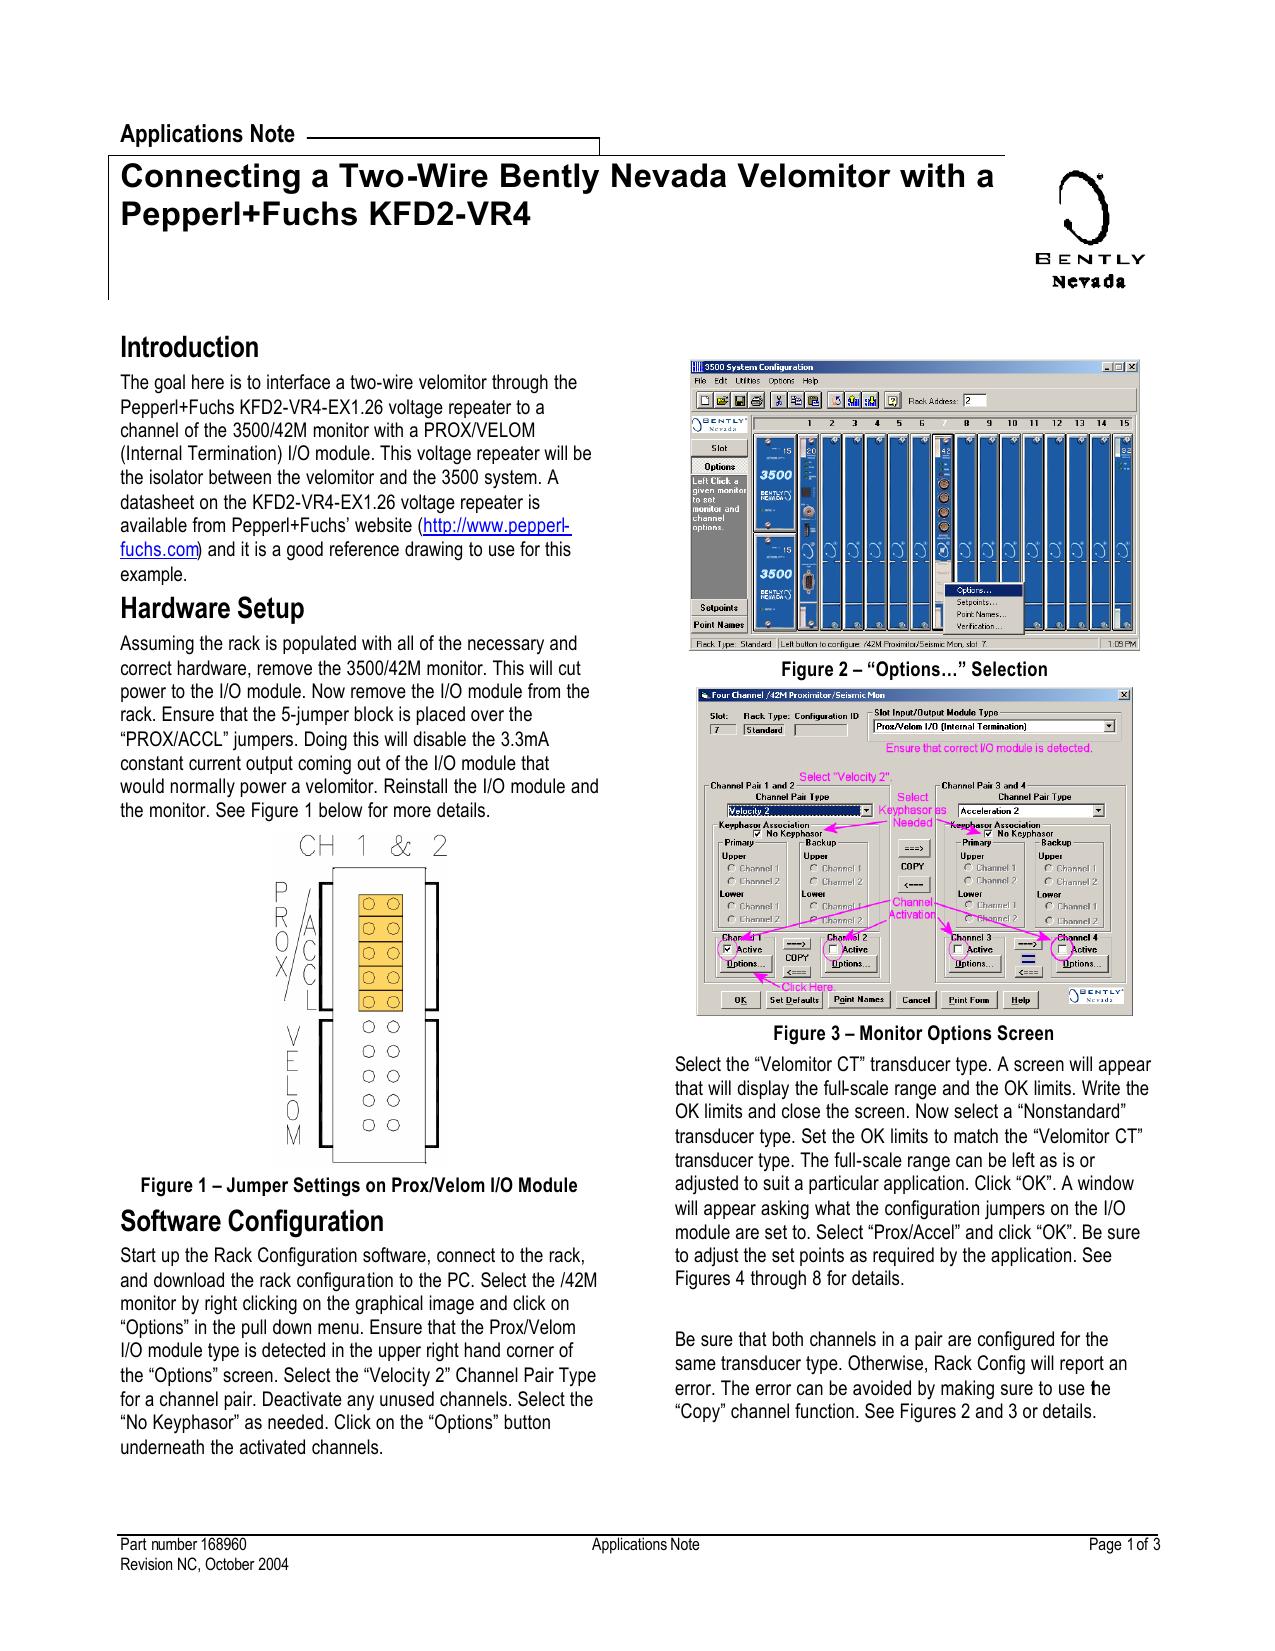 [QMVU_8575]  Connecting a Two-Wire Bently Nevada Velomitor | Manualzz | Bently Nevada Wiring Diagram |  | manualzz